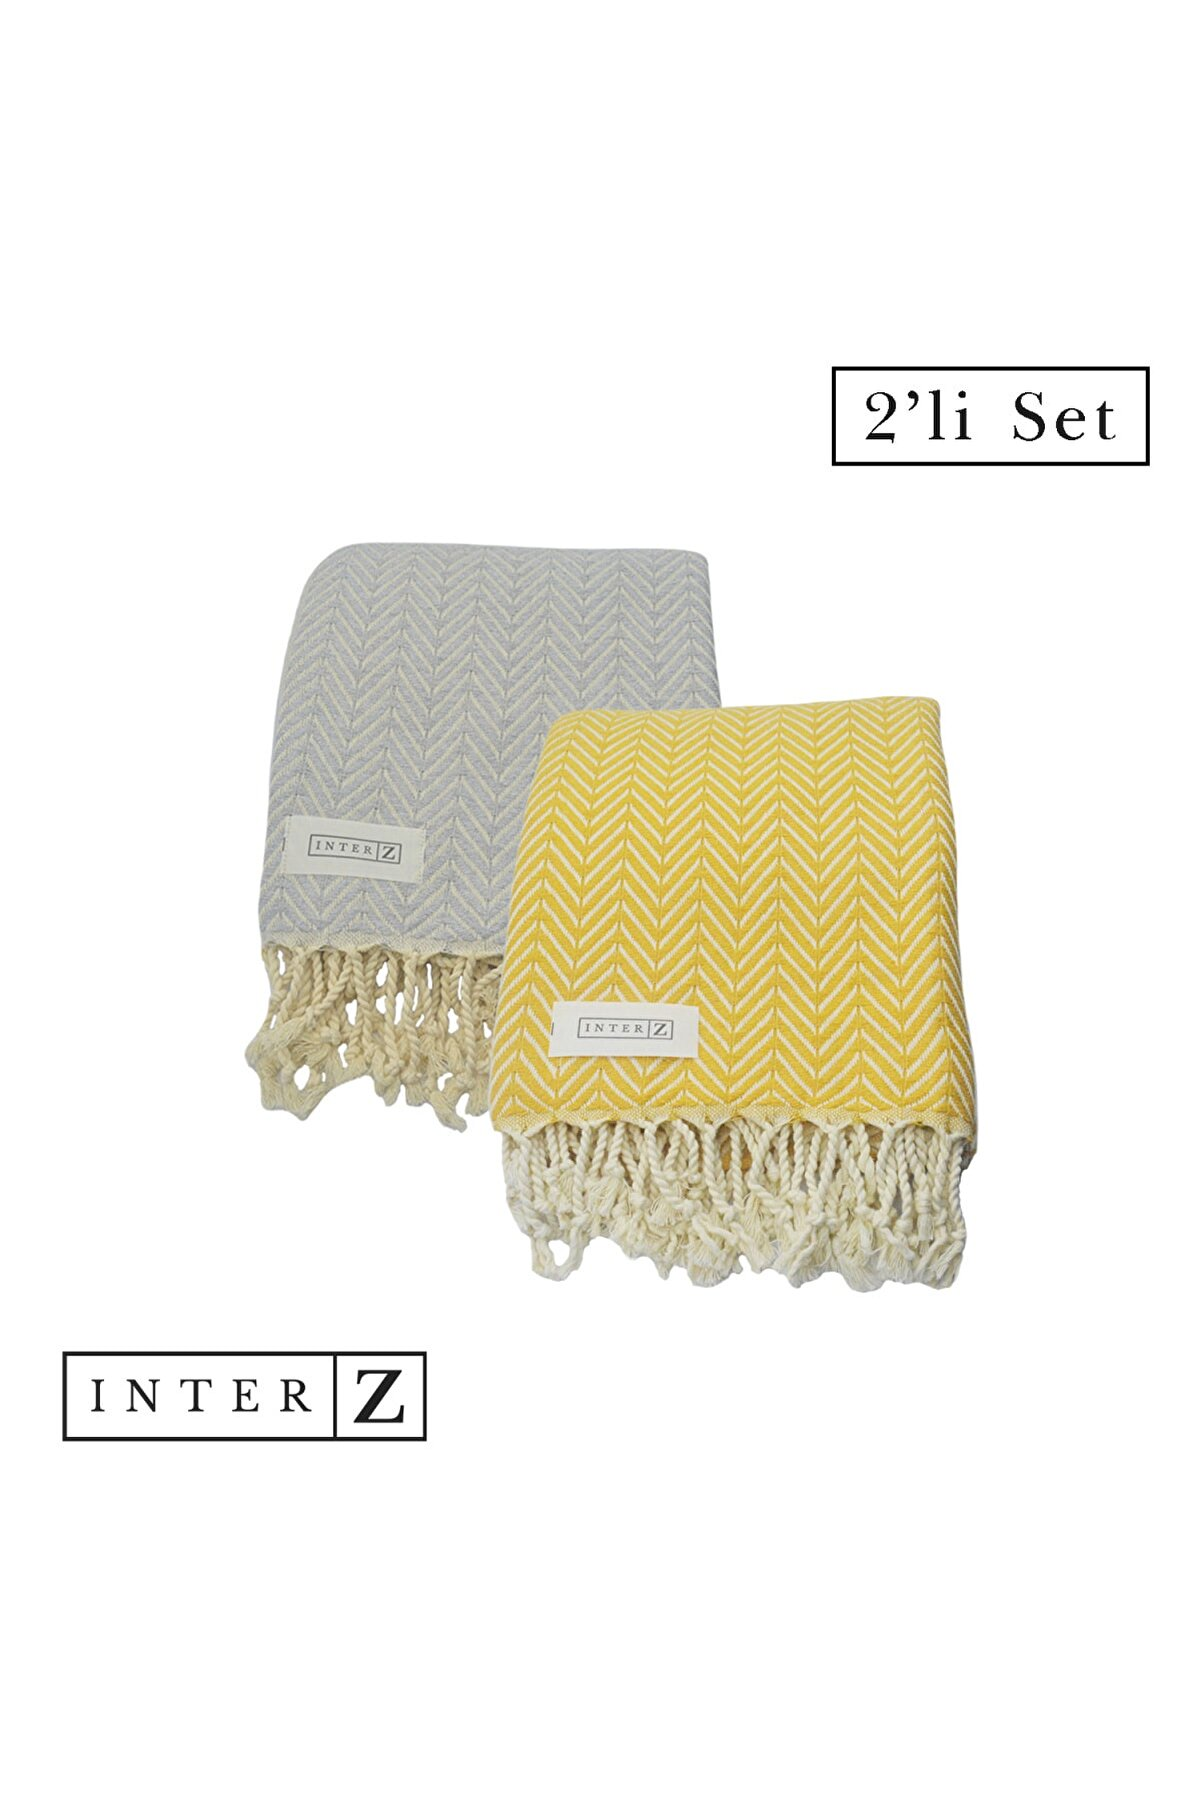 INTER Z 2'li Set Peştemal Plaj Havlusu , %100 Pamuk , Xxl 100x180cm, Marmaris, Bal Sarısı-gri